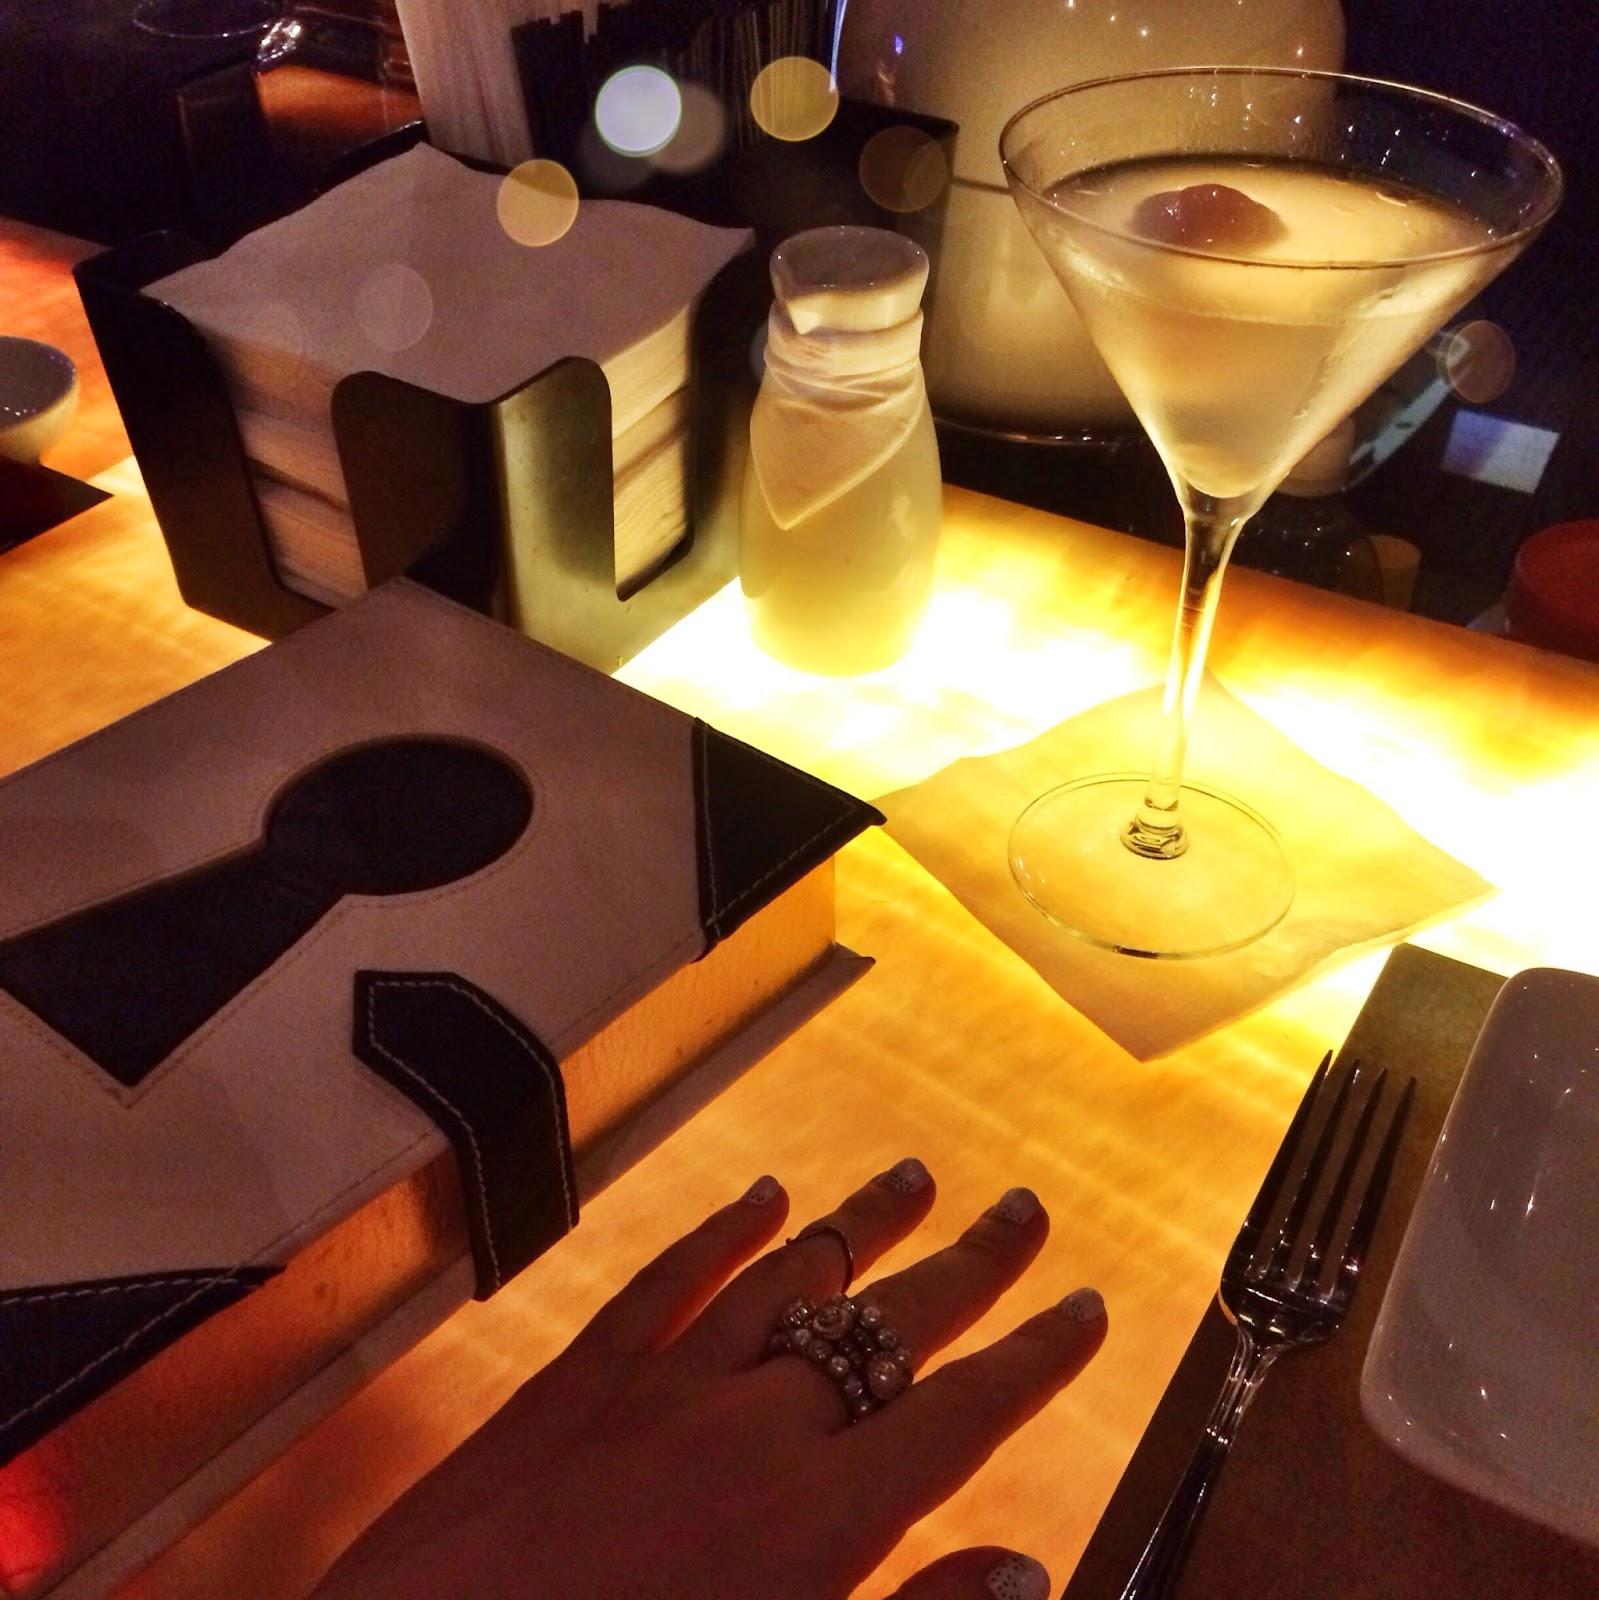 panama restaurantes, panama sake, sake restaurante, panama bar, panama tourism, panama restaurant, martini, lychee martini